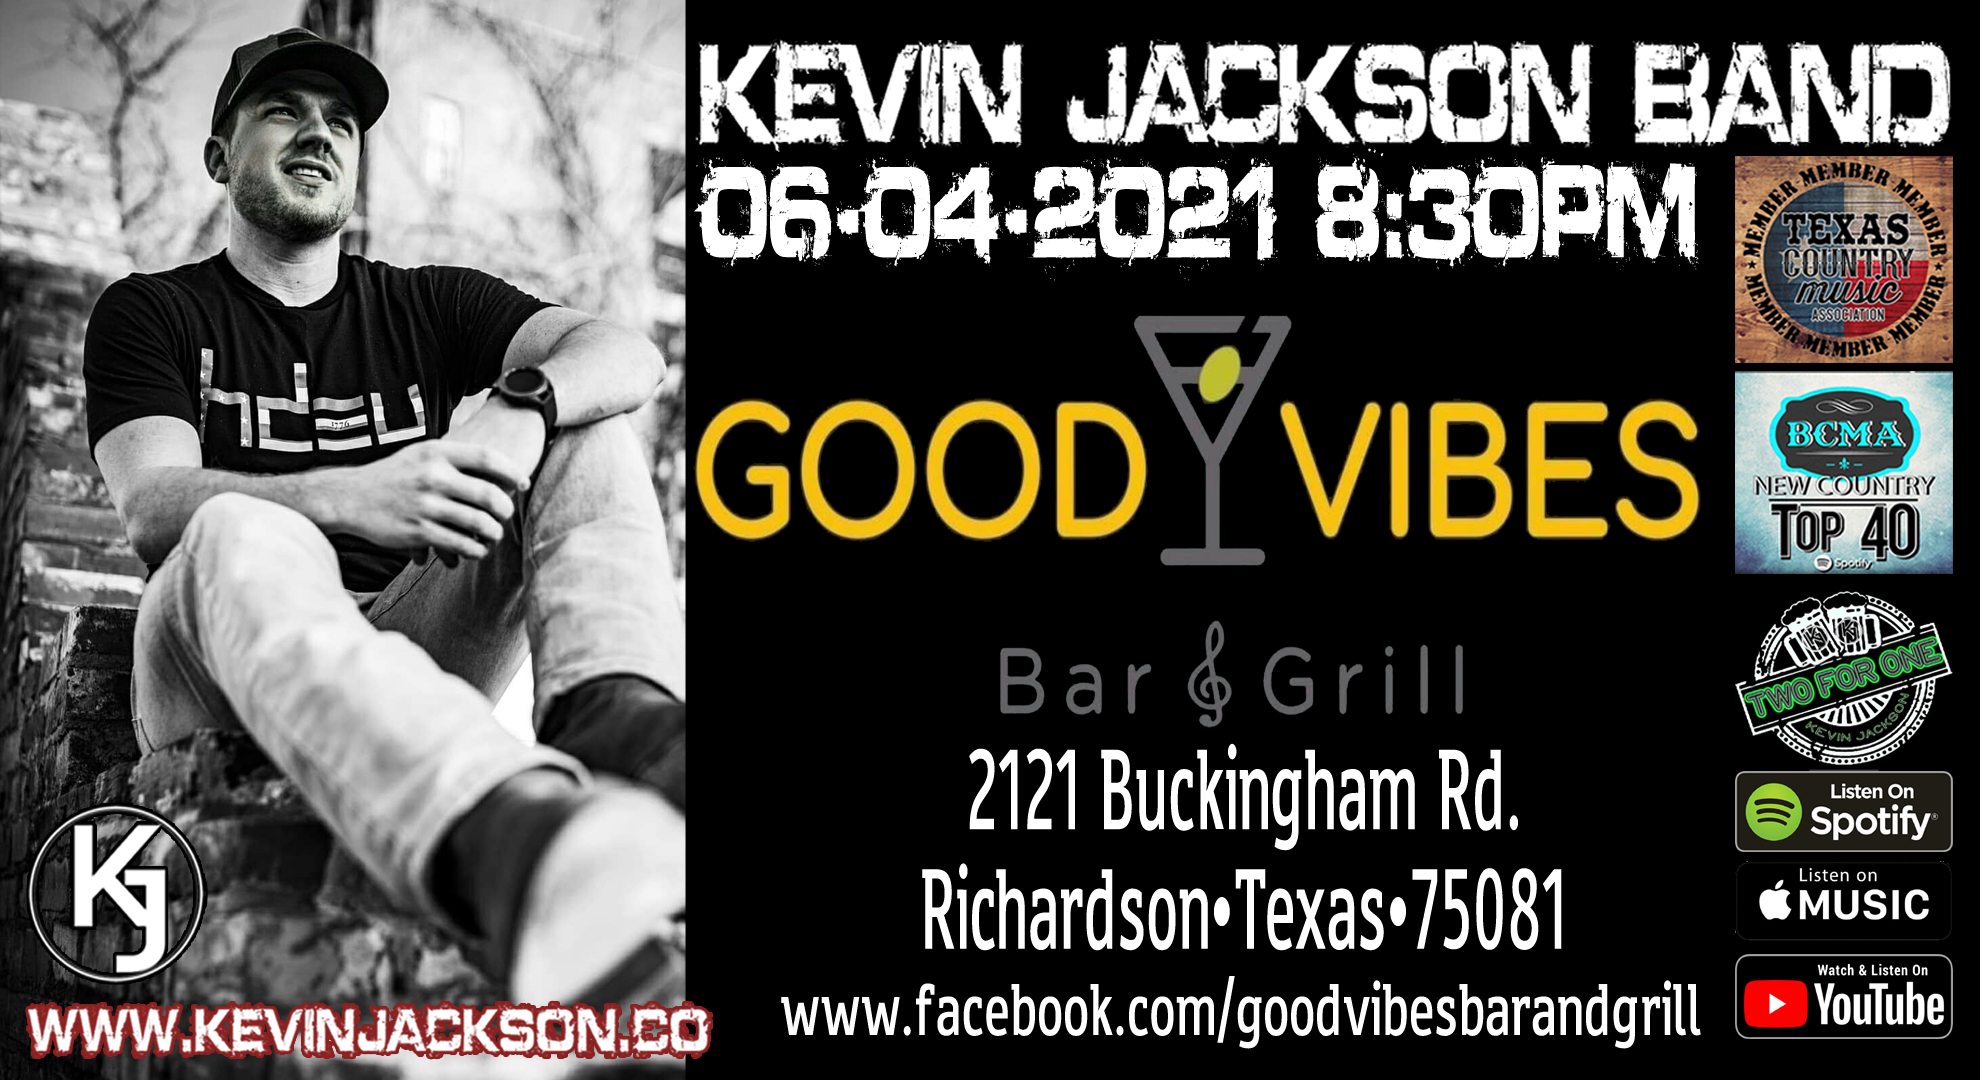 Kevin Jackson_GOOD VIBES_06-04-2021_10 c